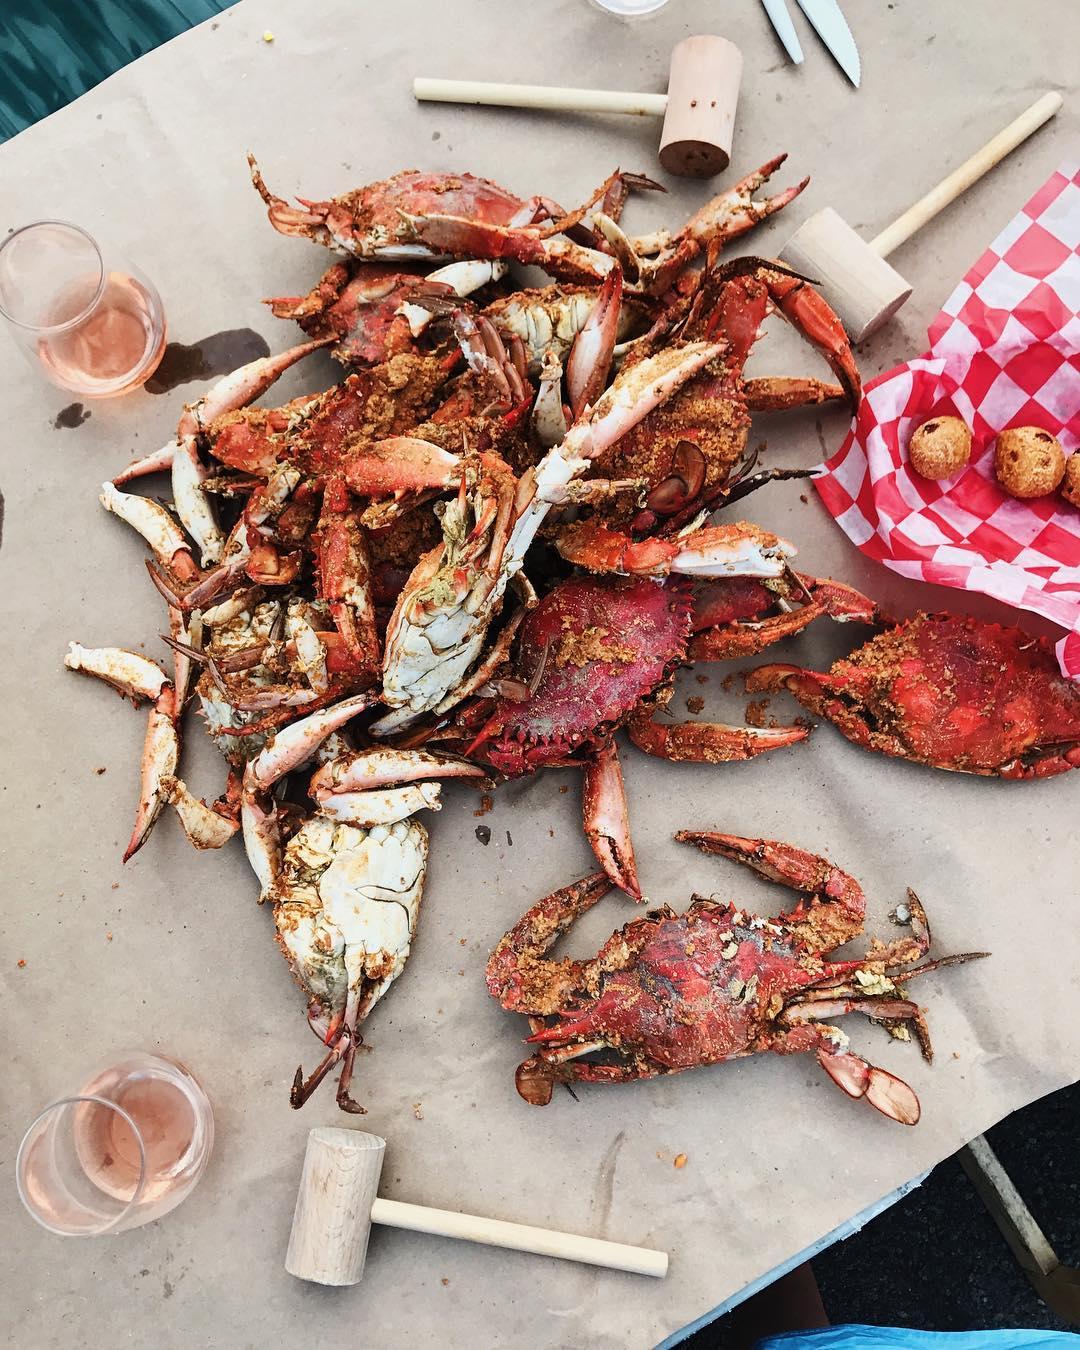 Quarterdeck Maryland crabs